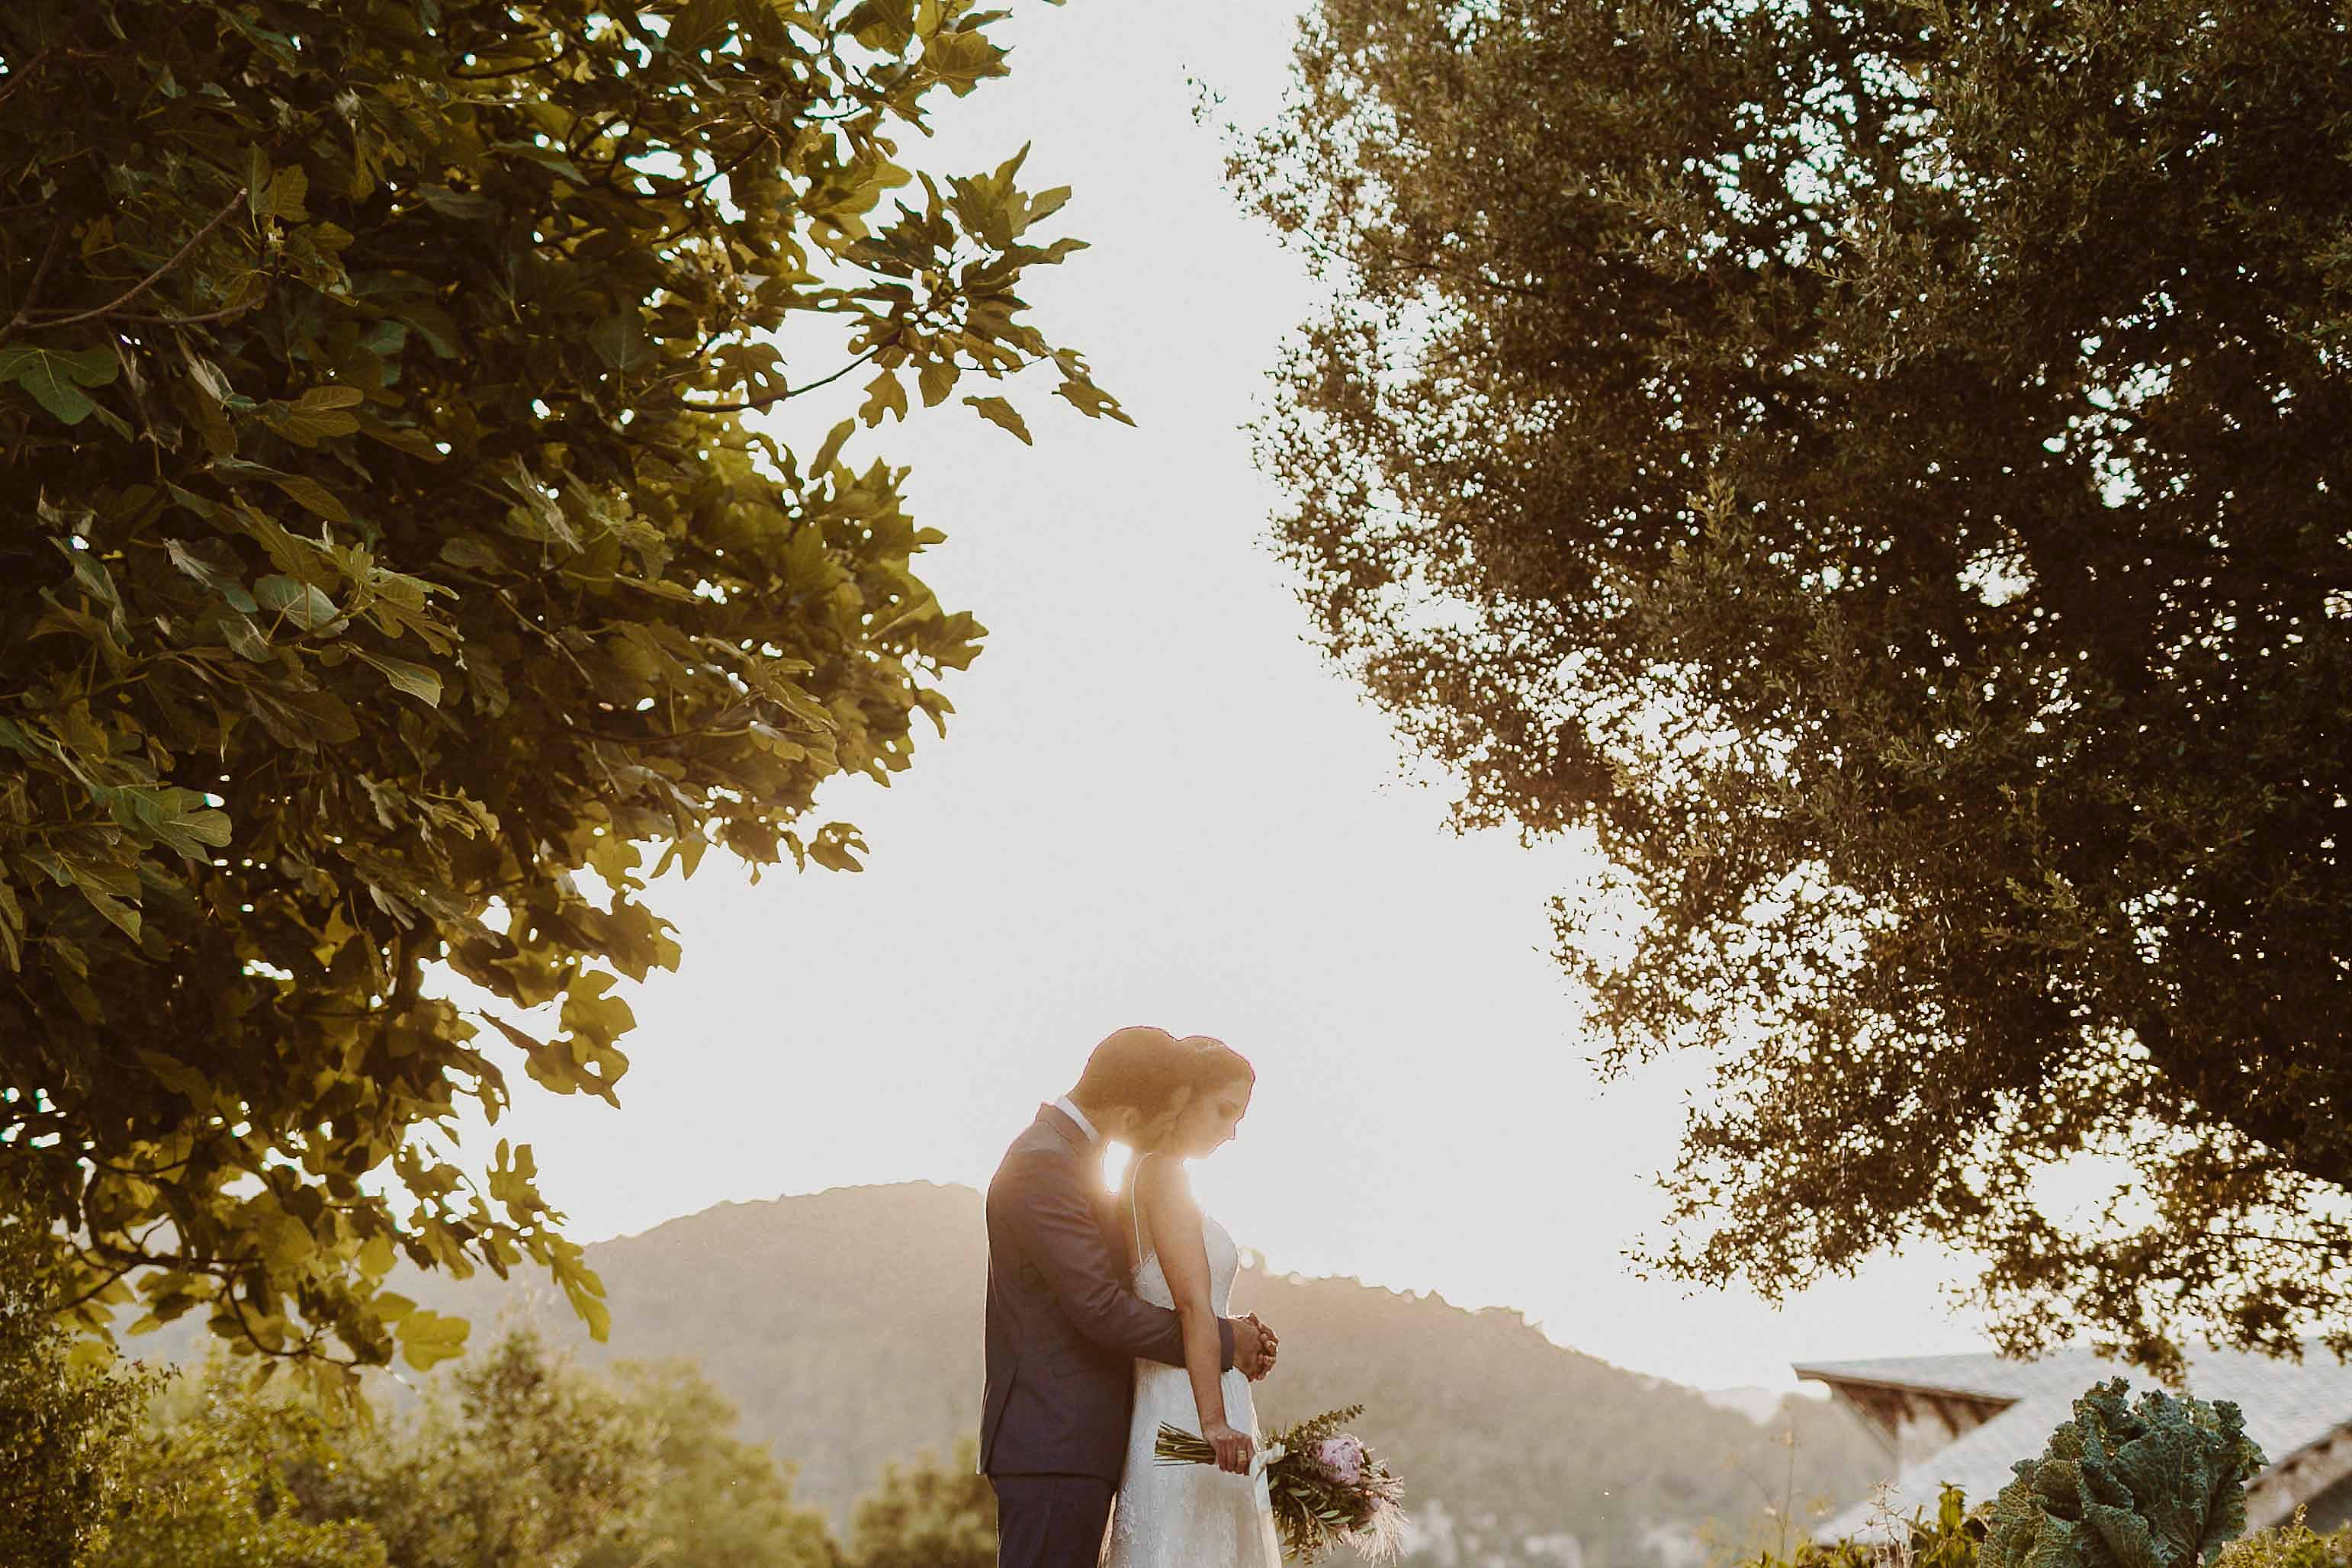 Boda rústica en la montaña. fotgrafo de bodas barcelona_068